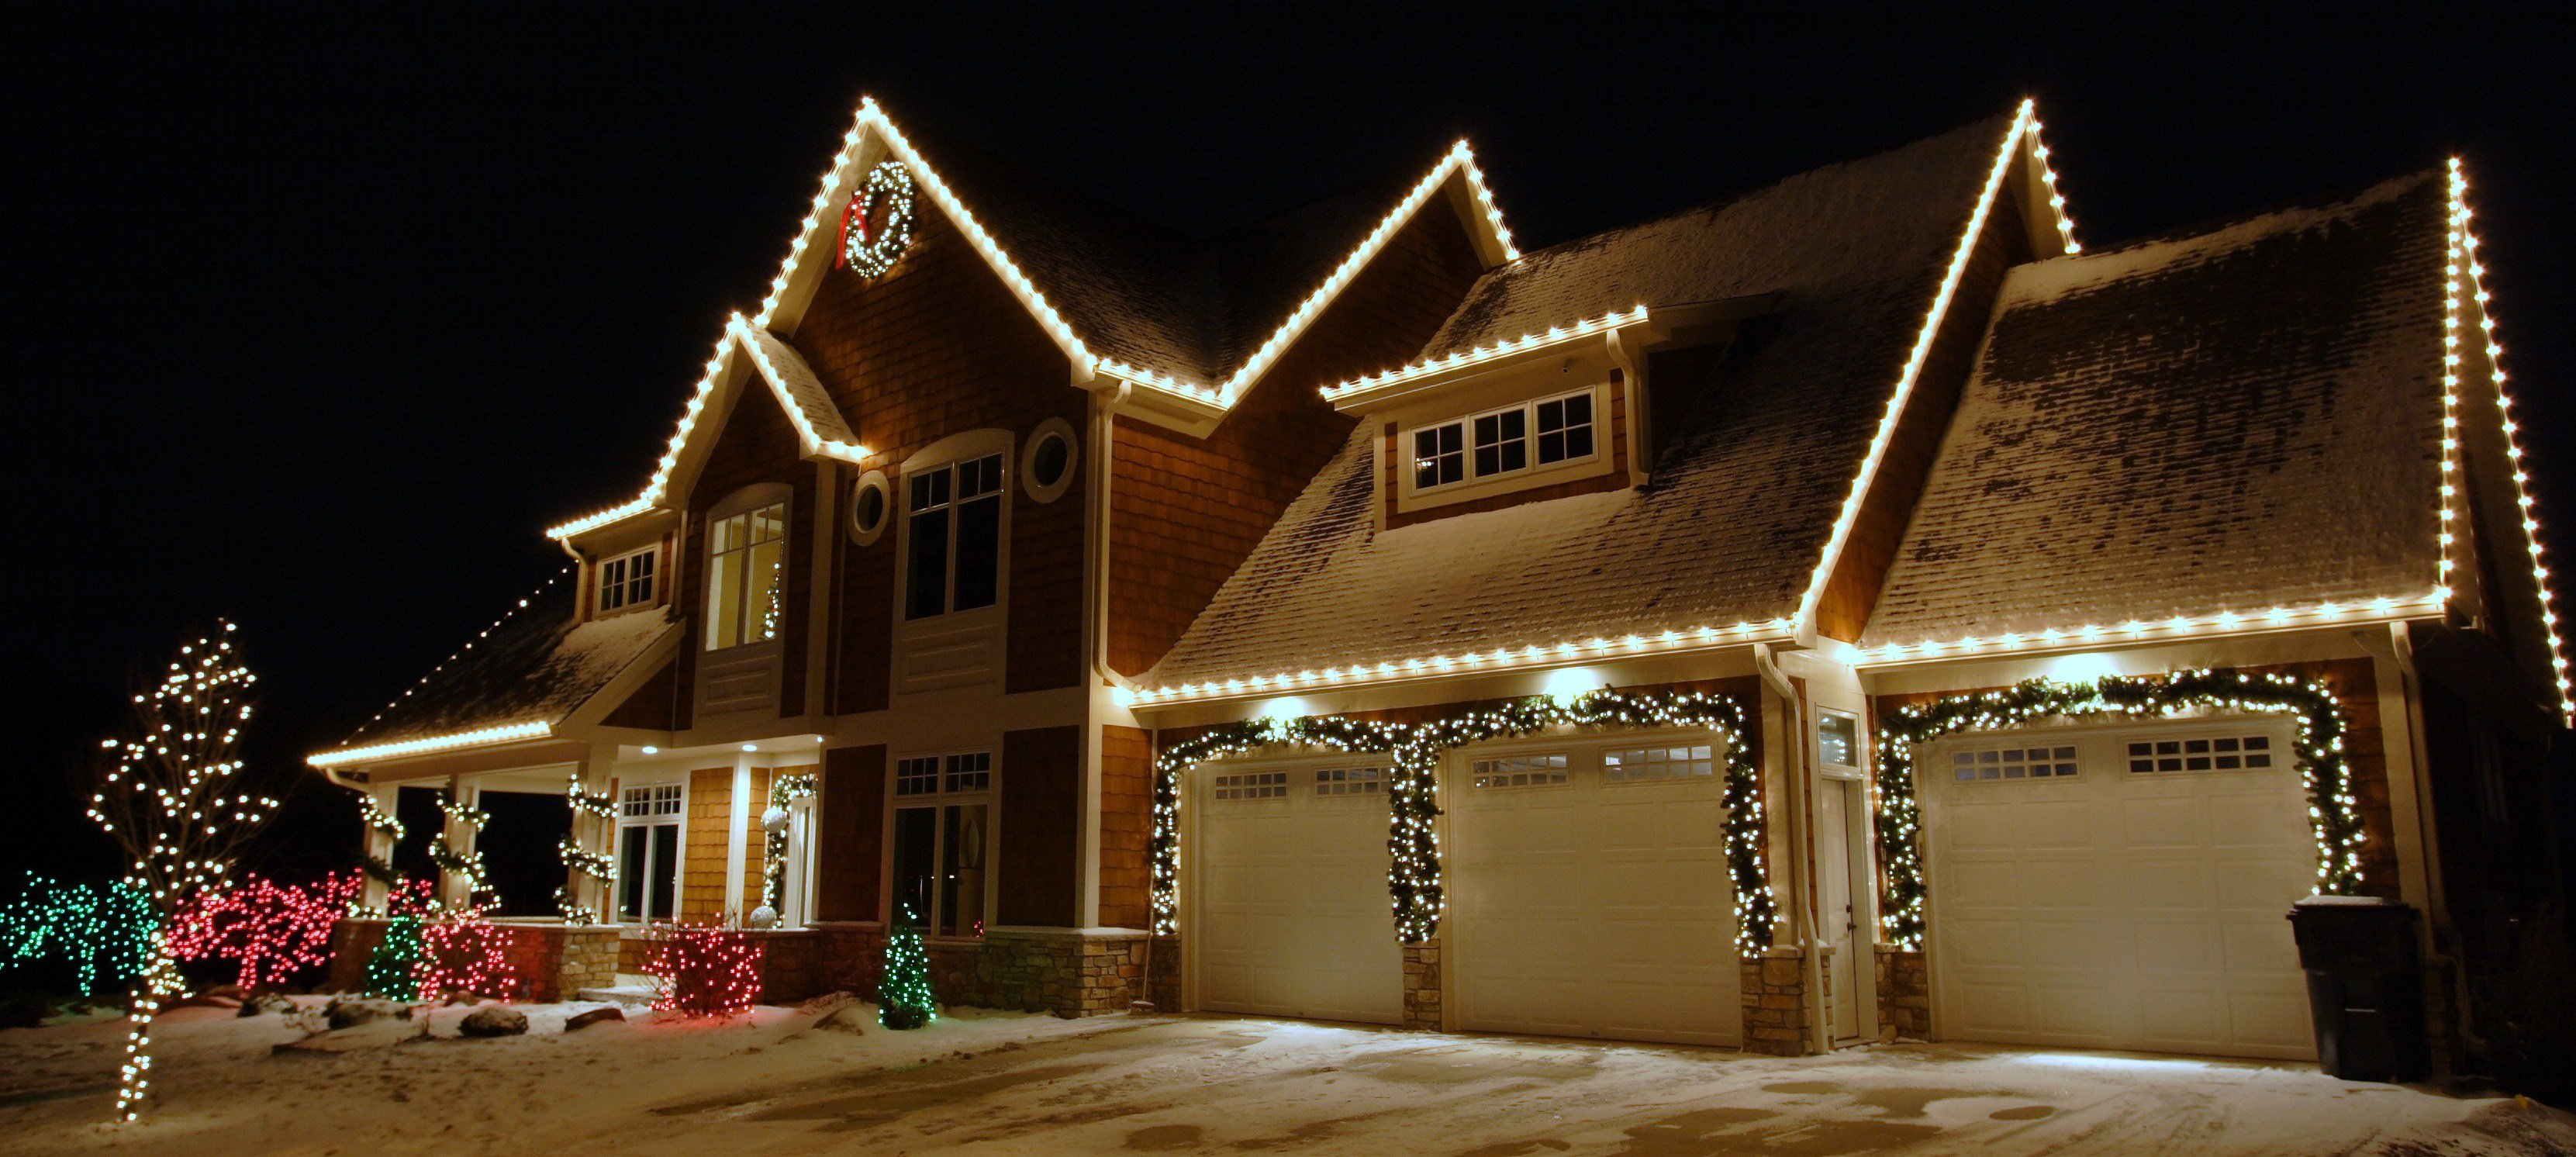 Christmas house decorations company